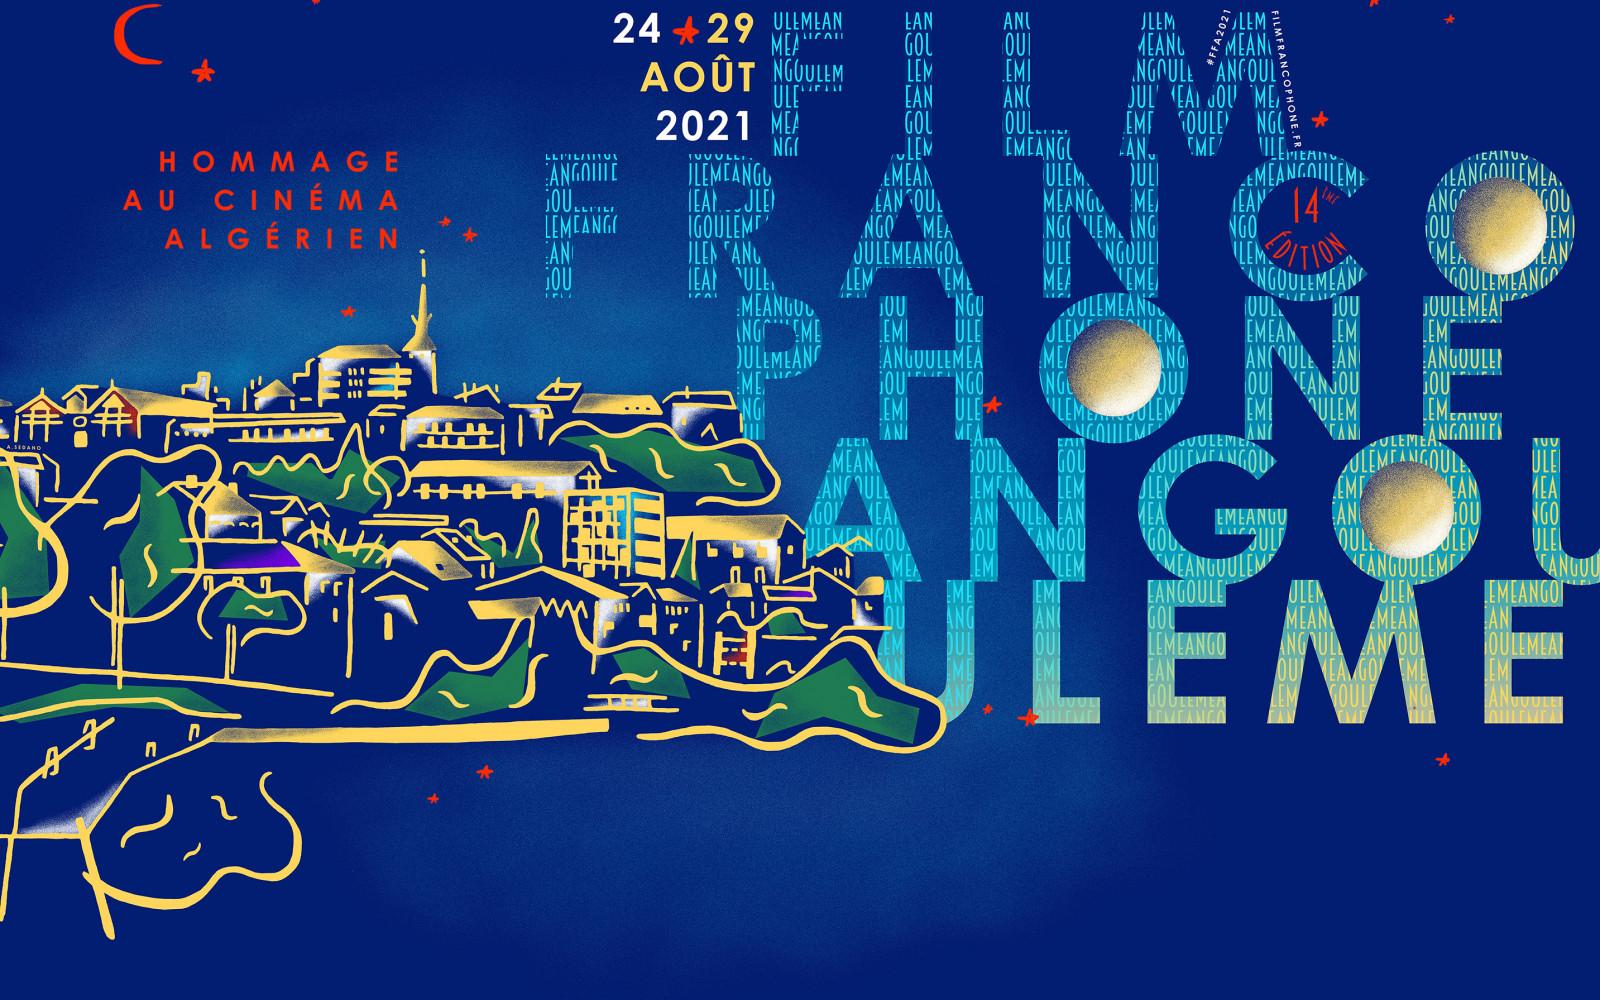 Festival film francophone Angoulême 2021 affiche